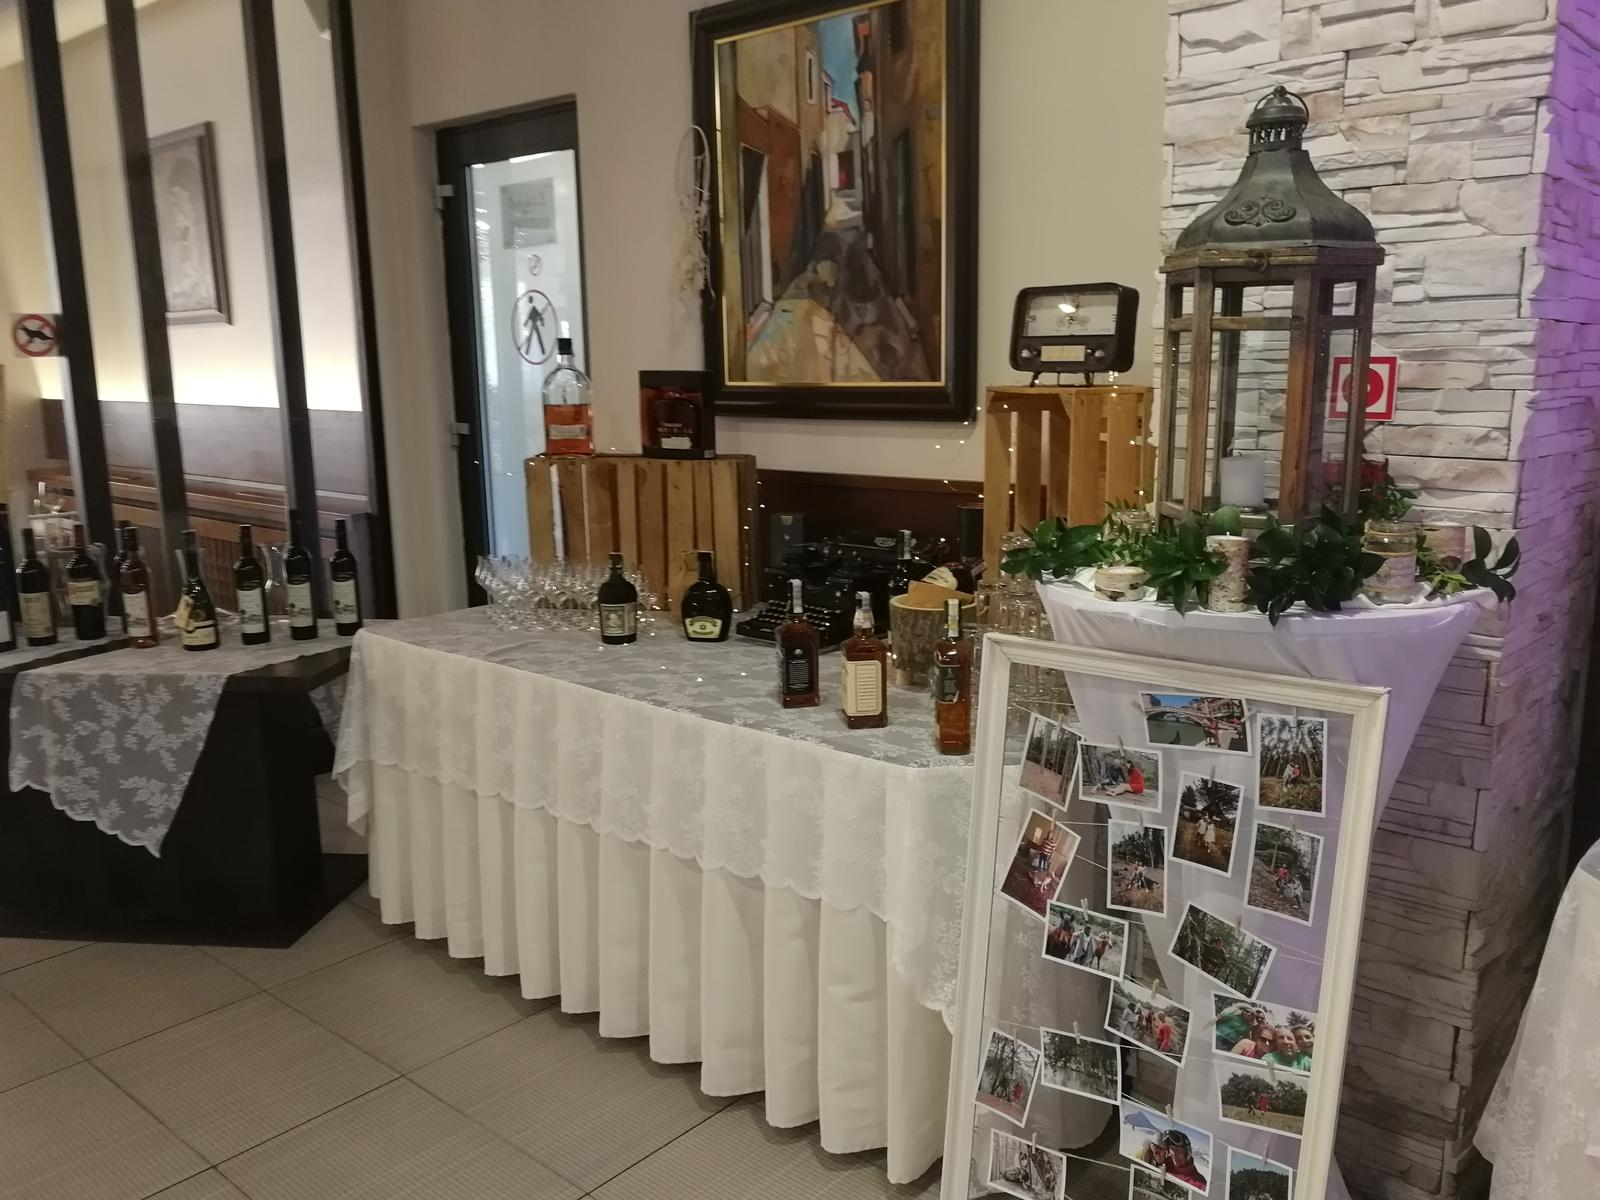 Svadba 29.9.2018 Hotel Kontakt - Obrázok č. 4